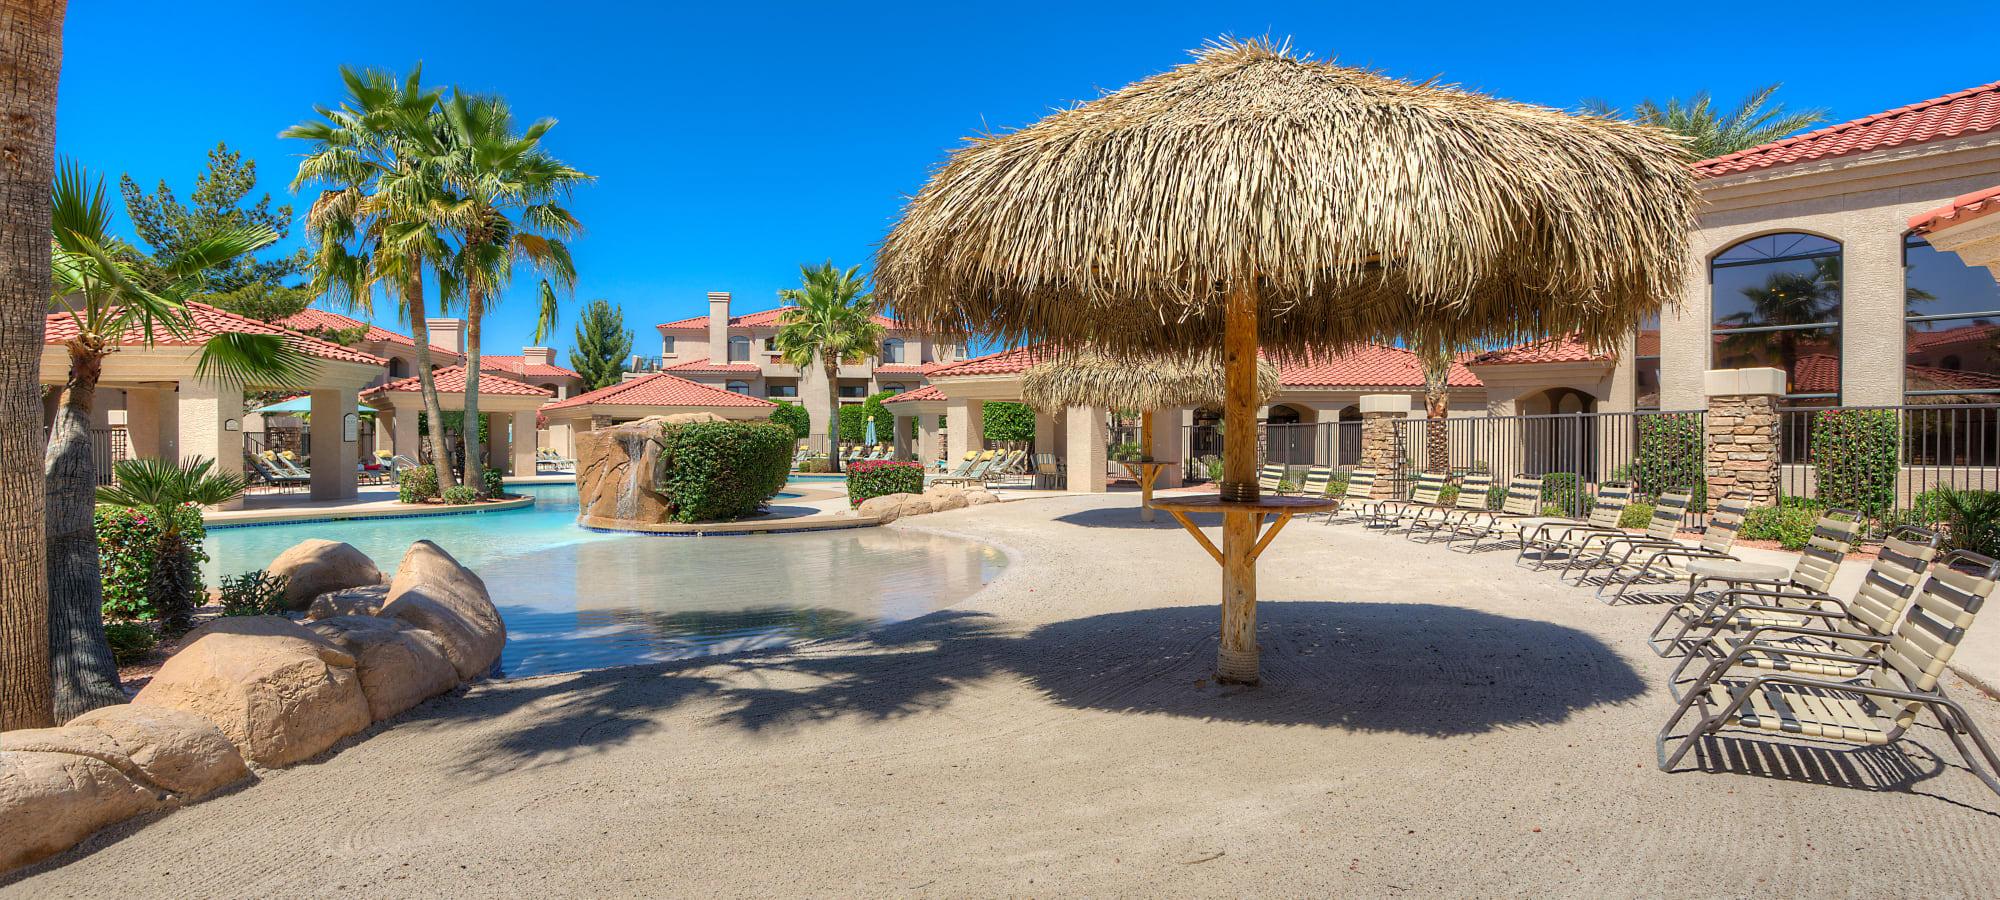 Poolside grass umbrellas at San Lagos in Glendale, Arizona